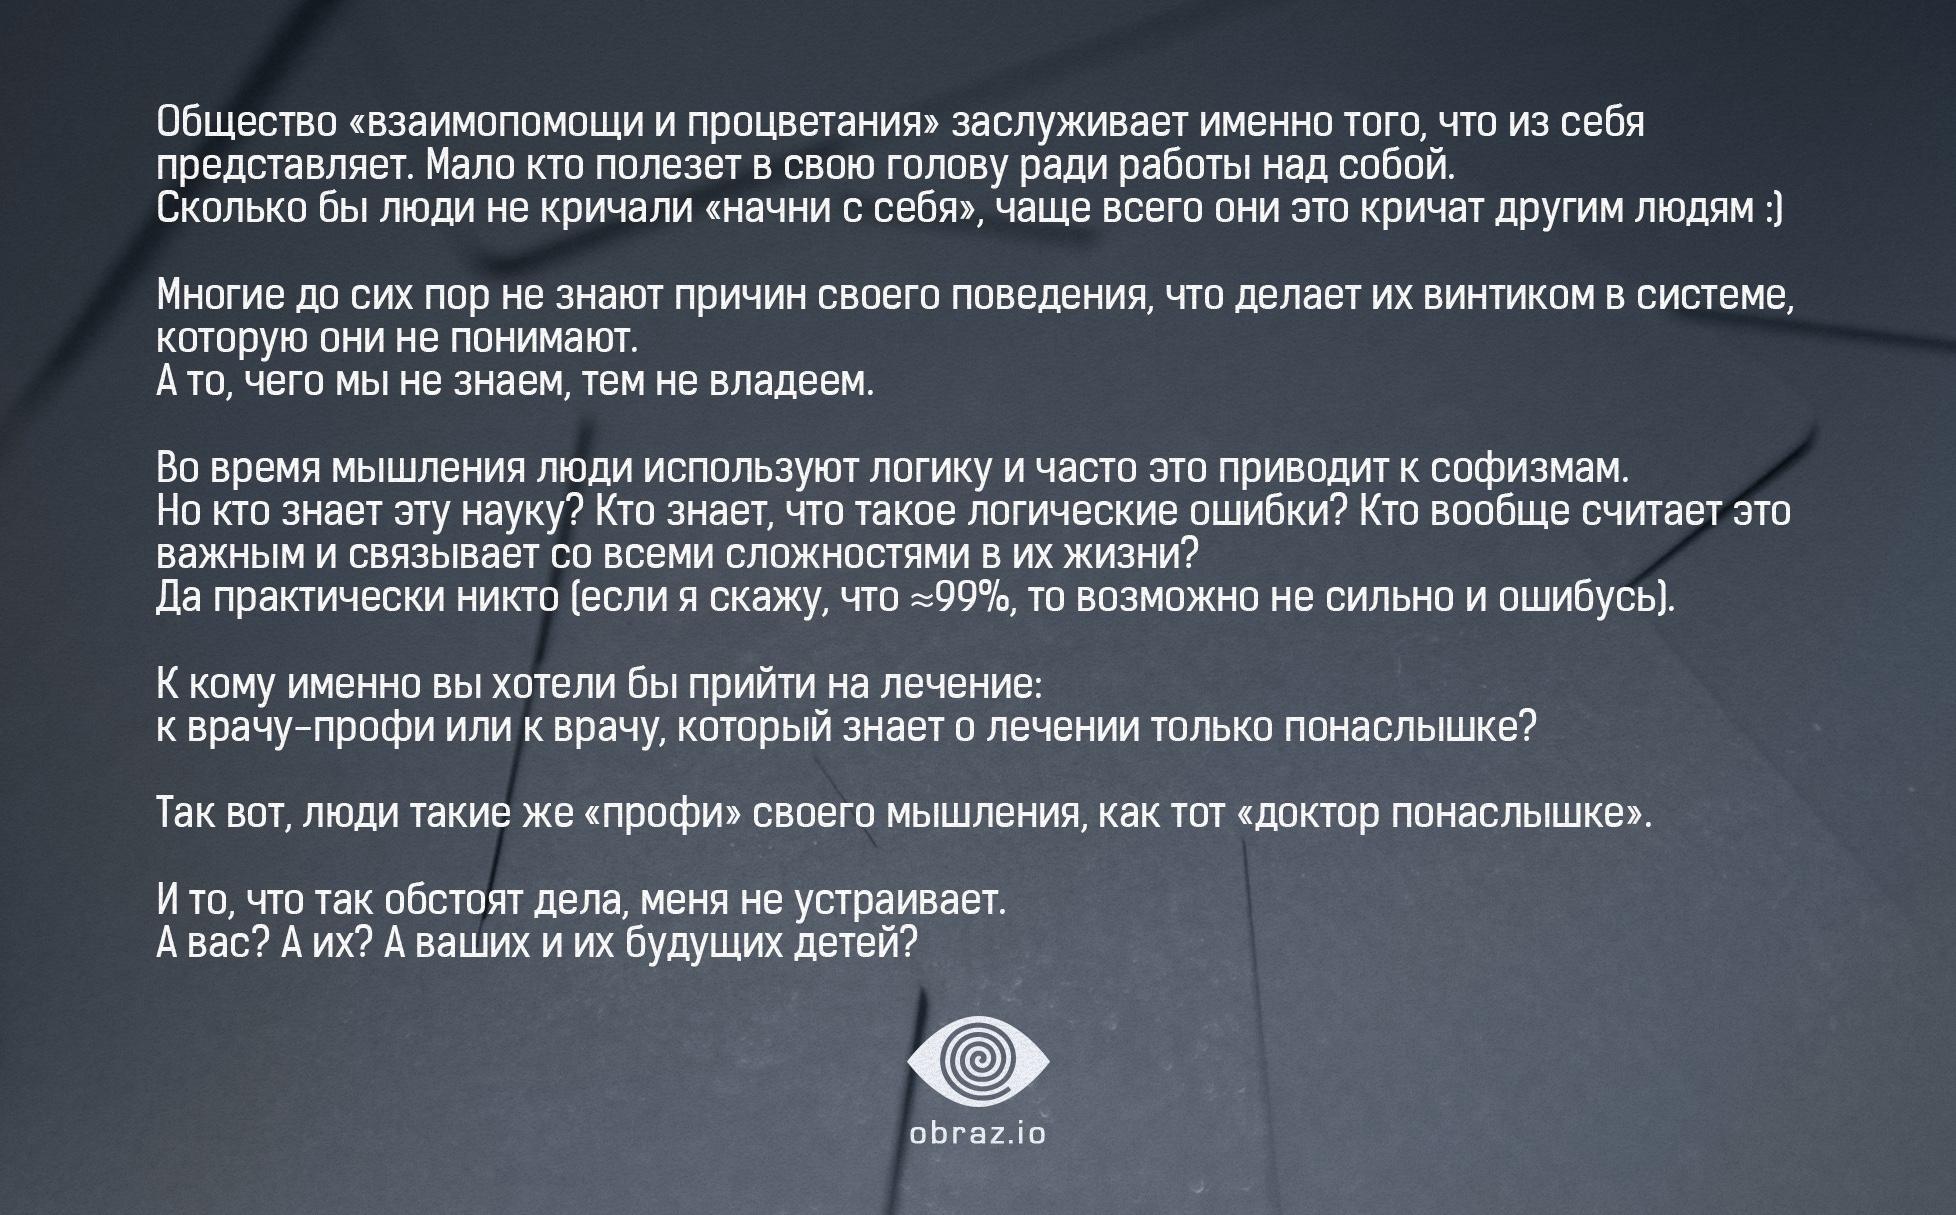 Email:learningkurakov@gmail com3292 curgtz.o0j23uwhfr